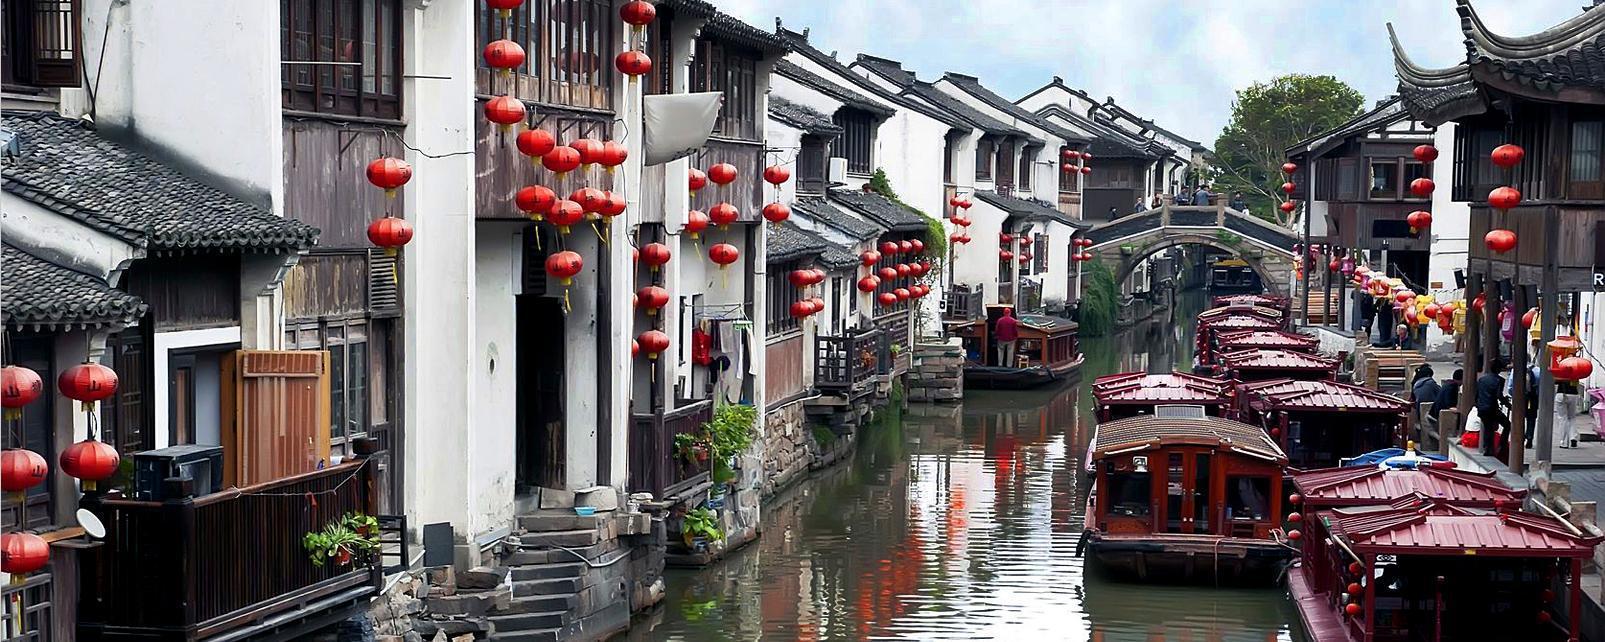 Travel To Suzhou China Suzhou Travel Guide Easyvoyage